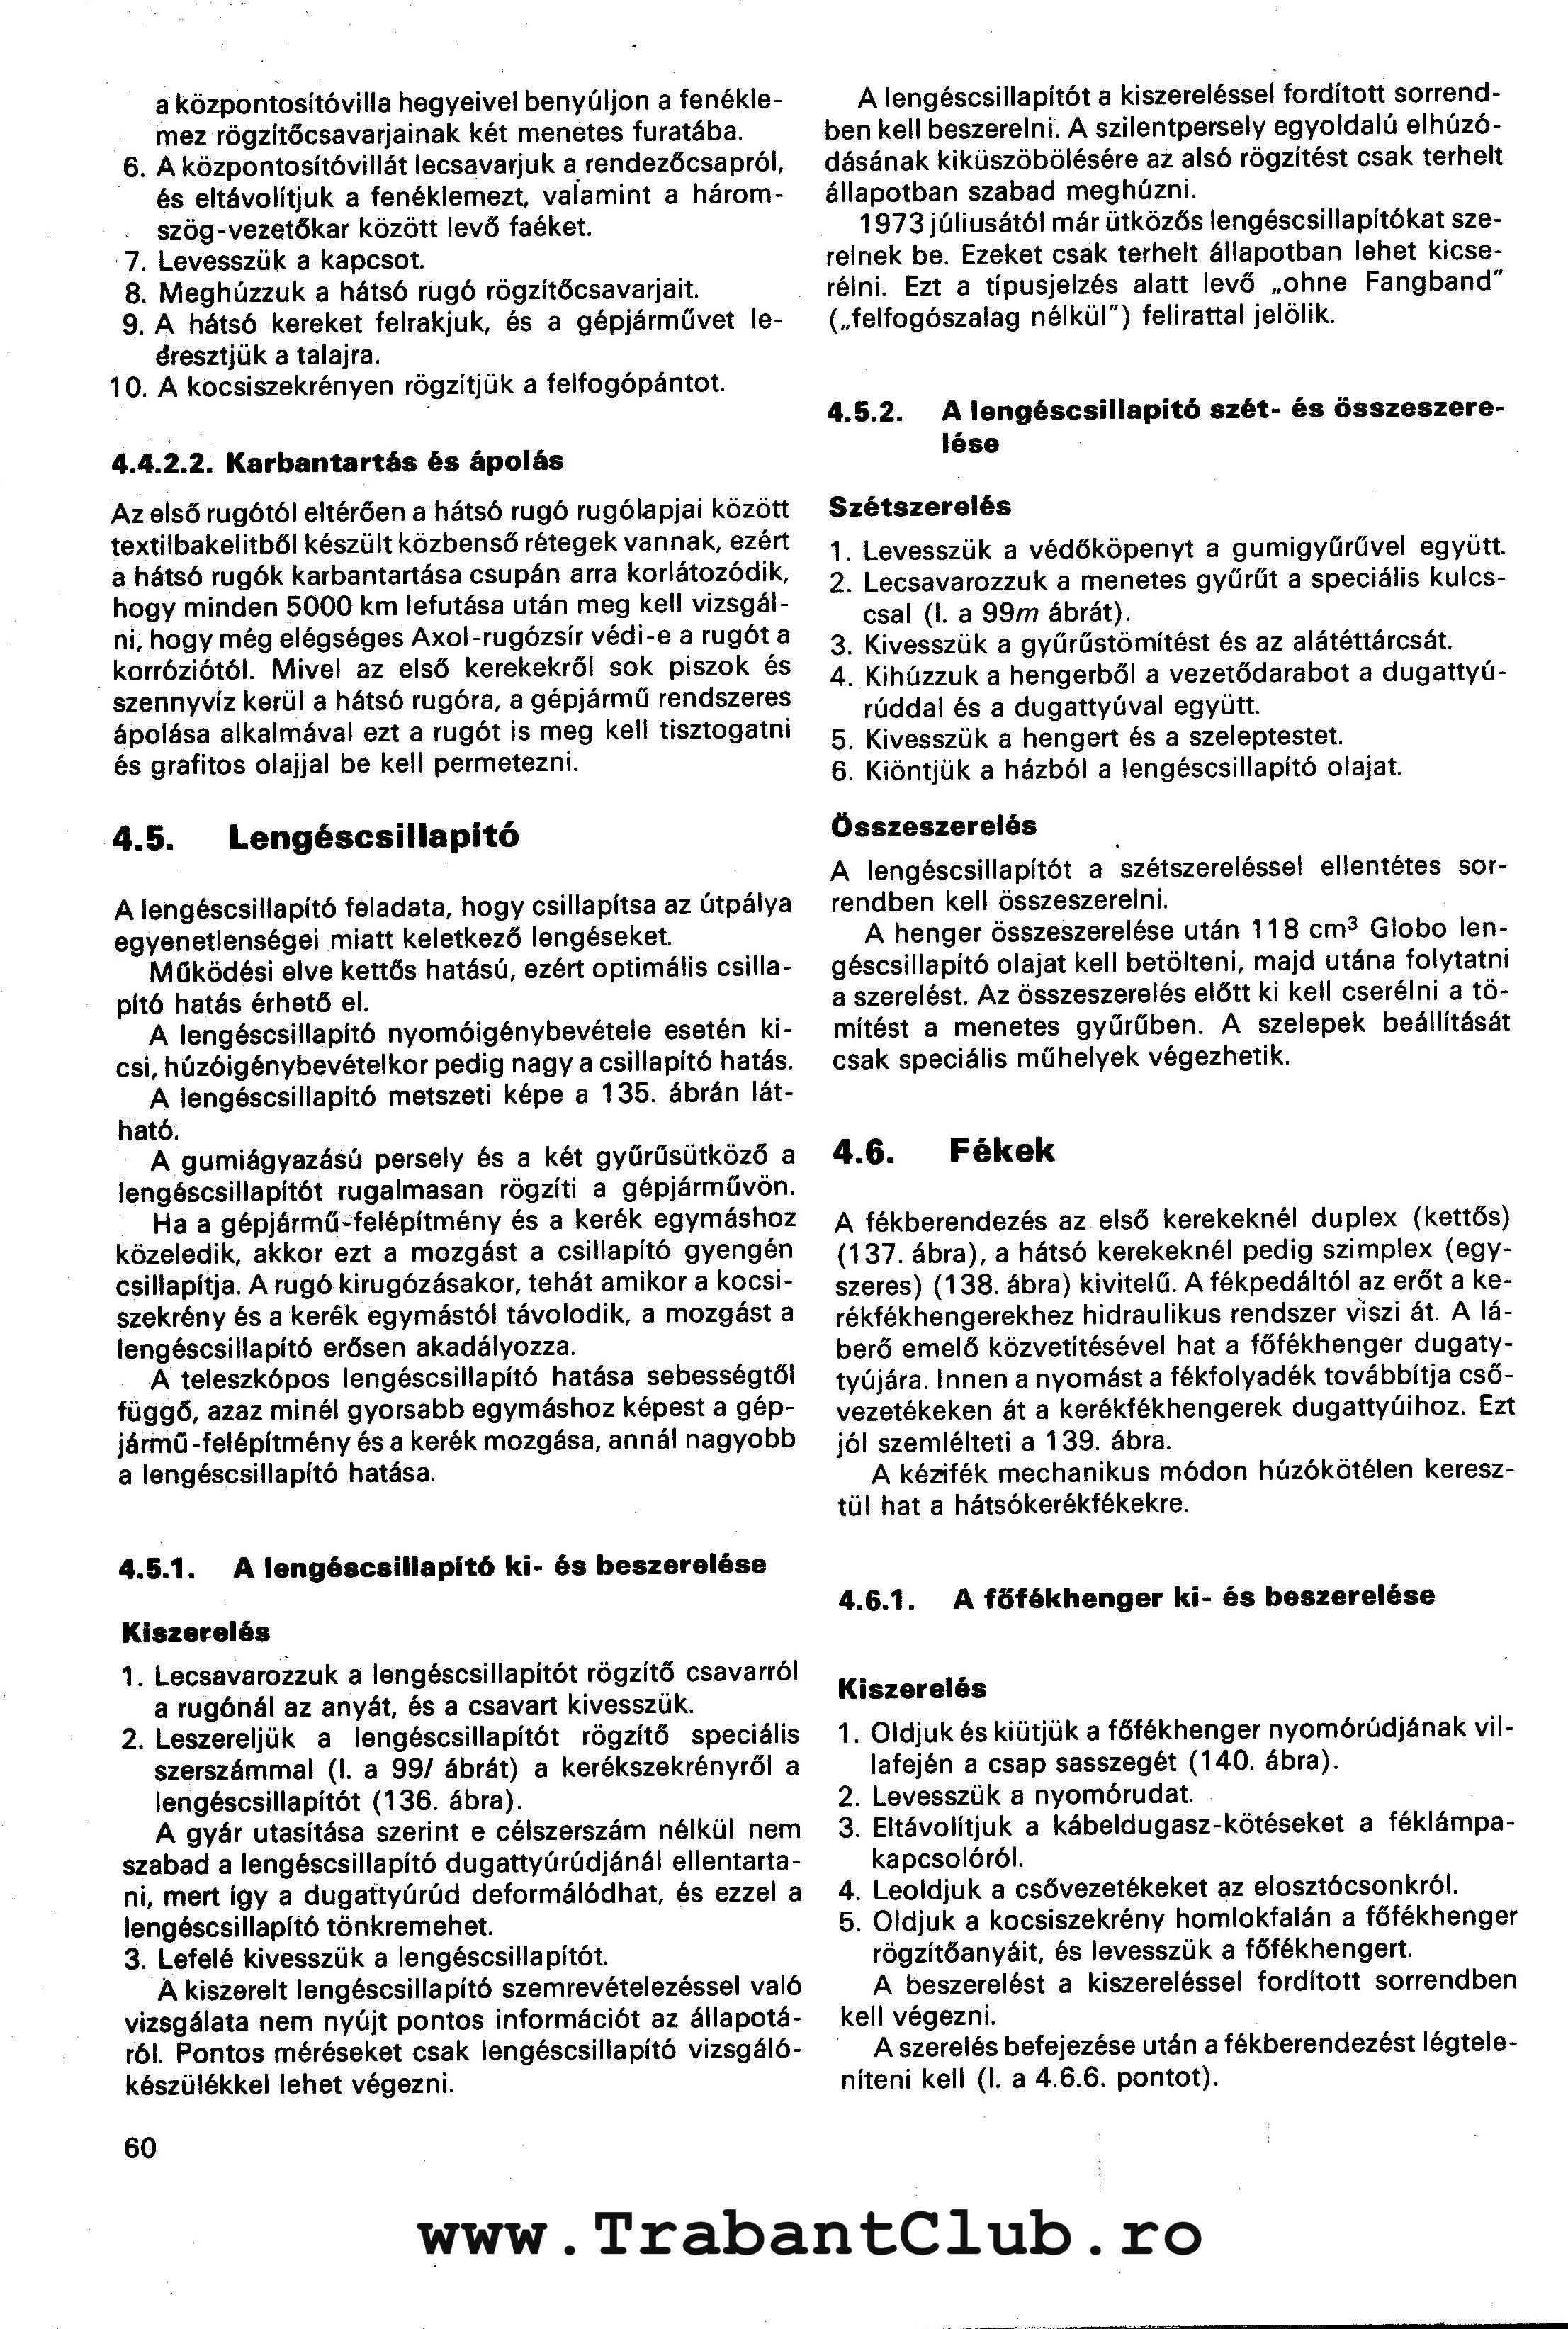 TRABANT 601 Javitasi Segedkonyv062.jpg